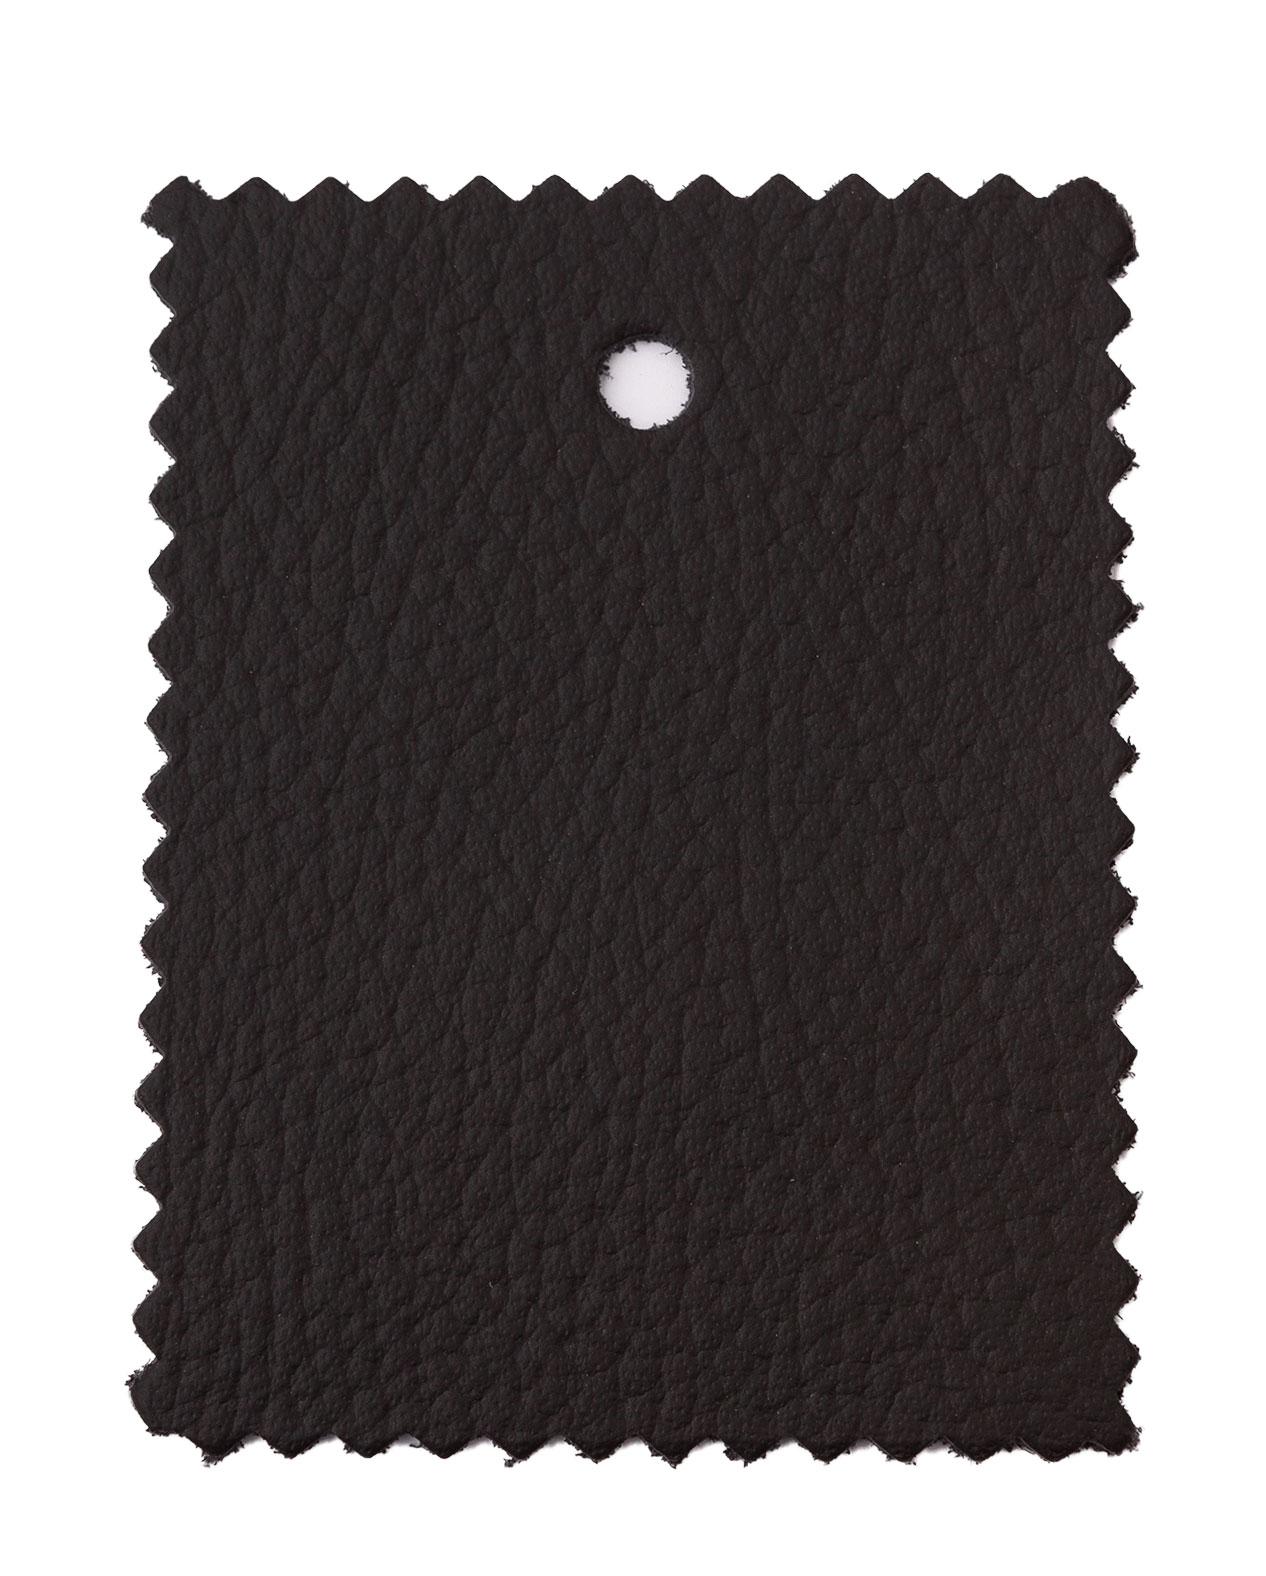 Abbildung bmw-dakota-schwarz